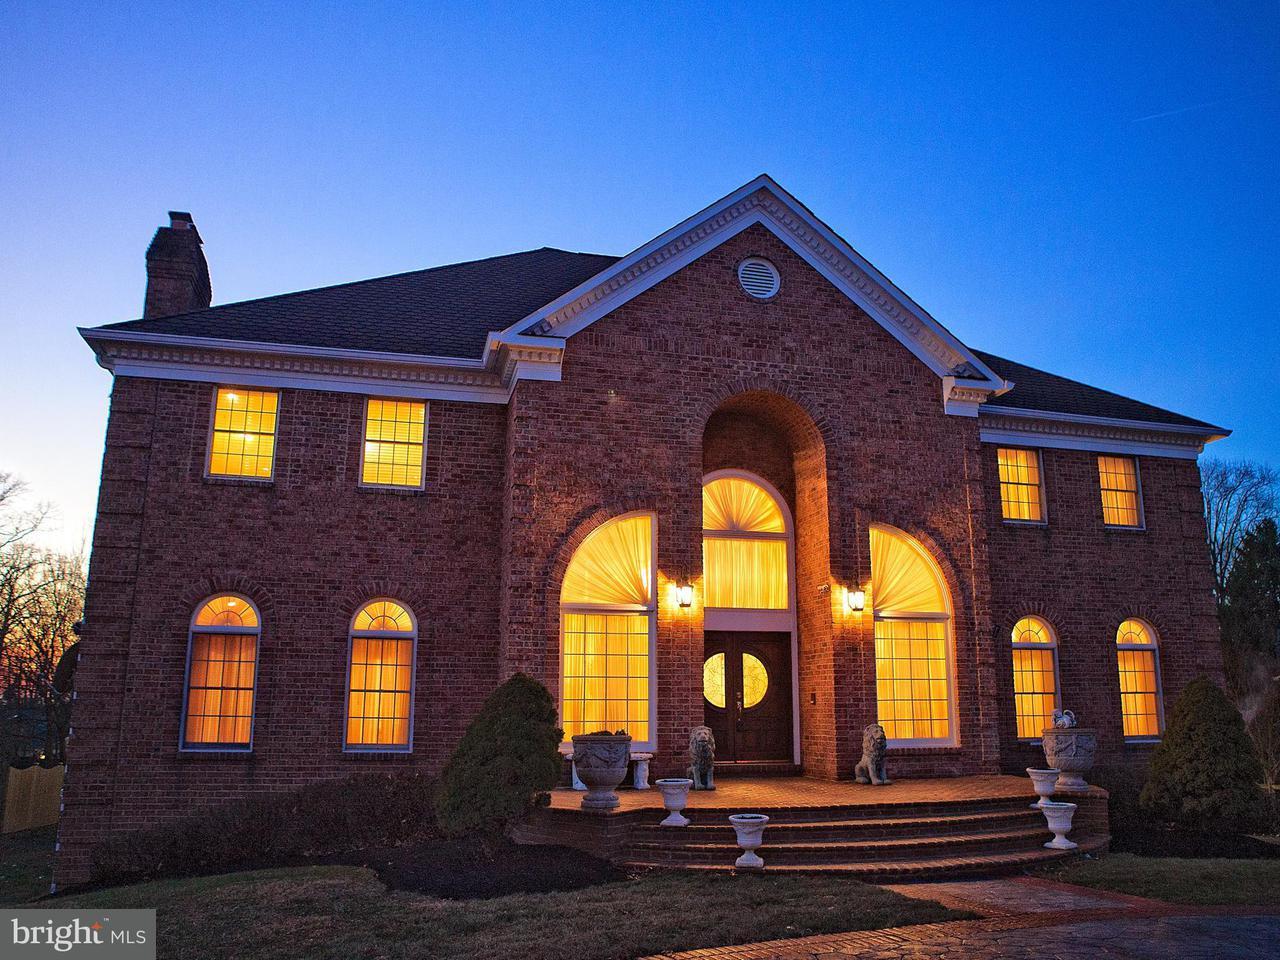 Single Family Home for Sale at 930 Seneca Road 930 Seneca Road Great Falls, Virginia 22066 United States